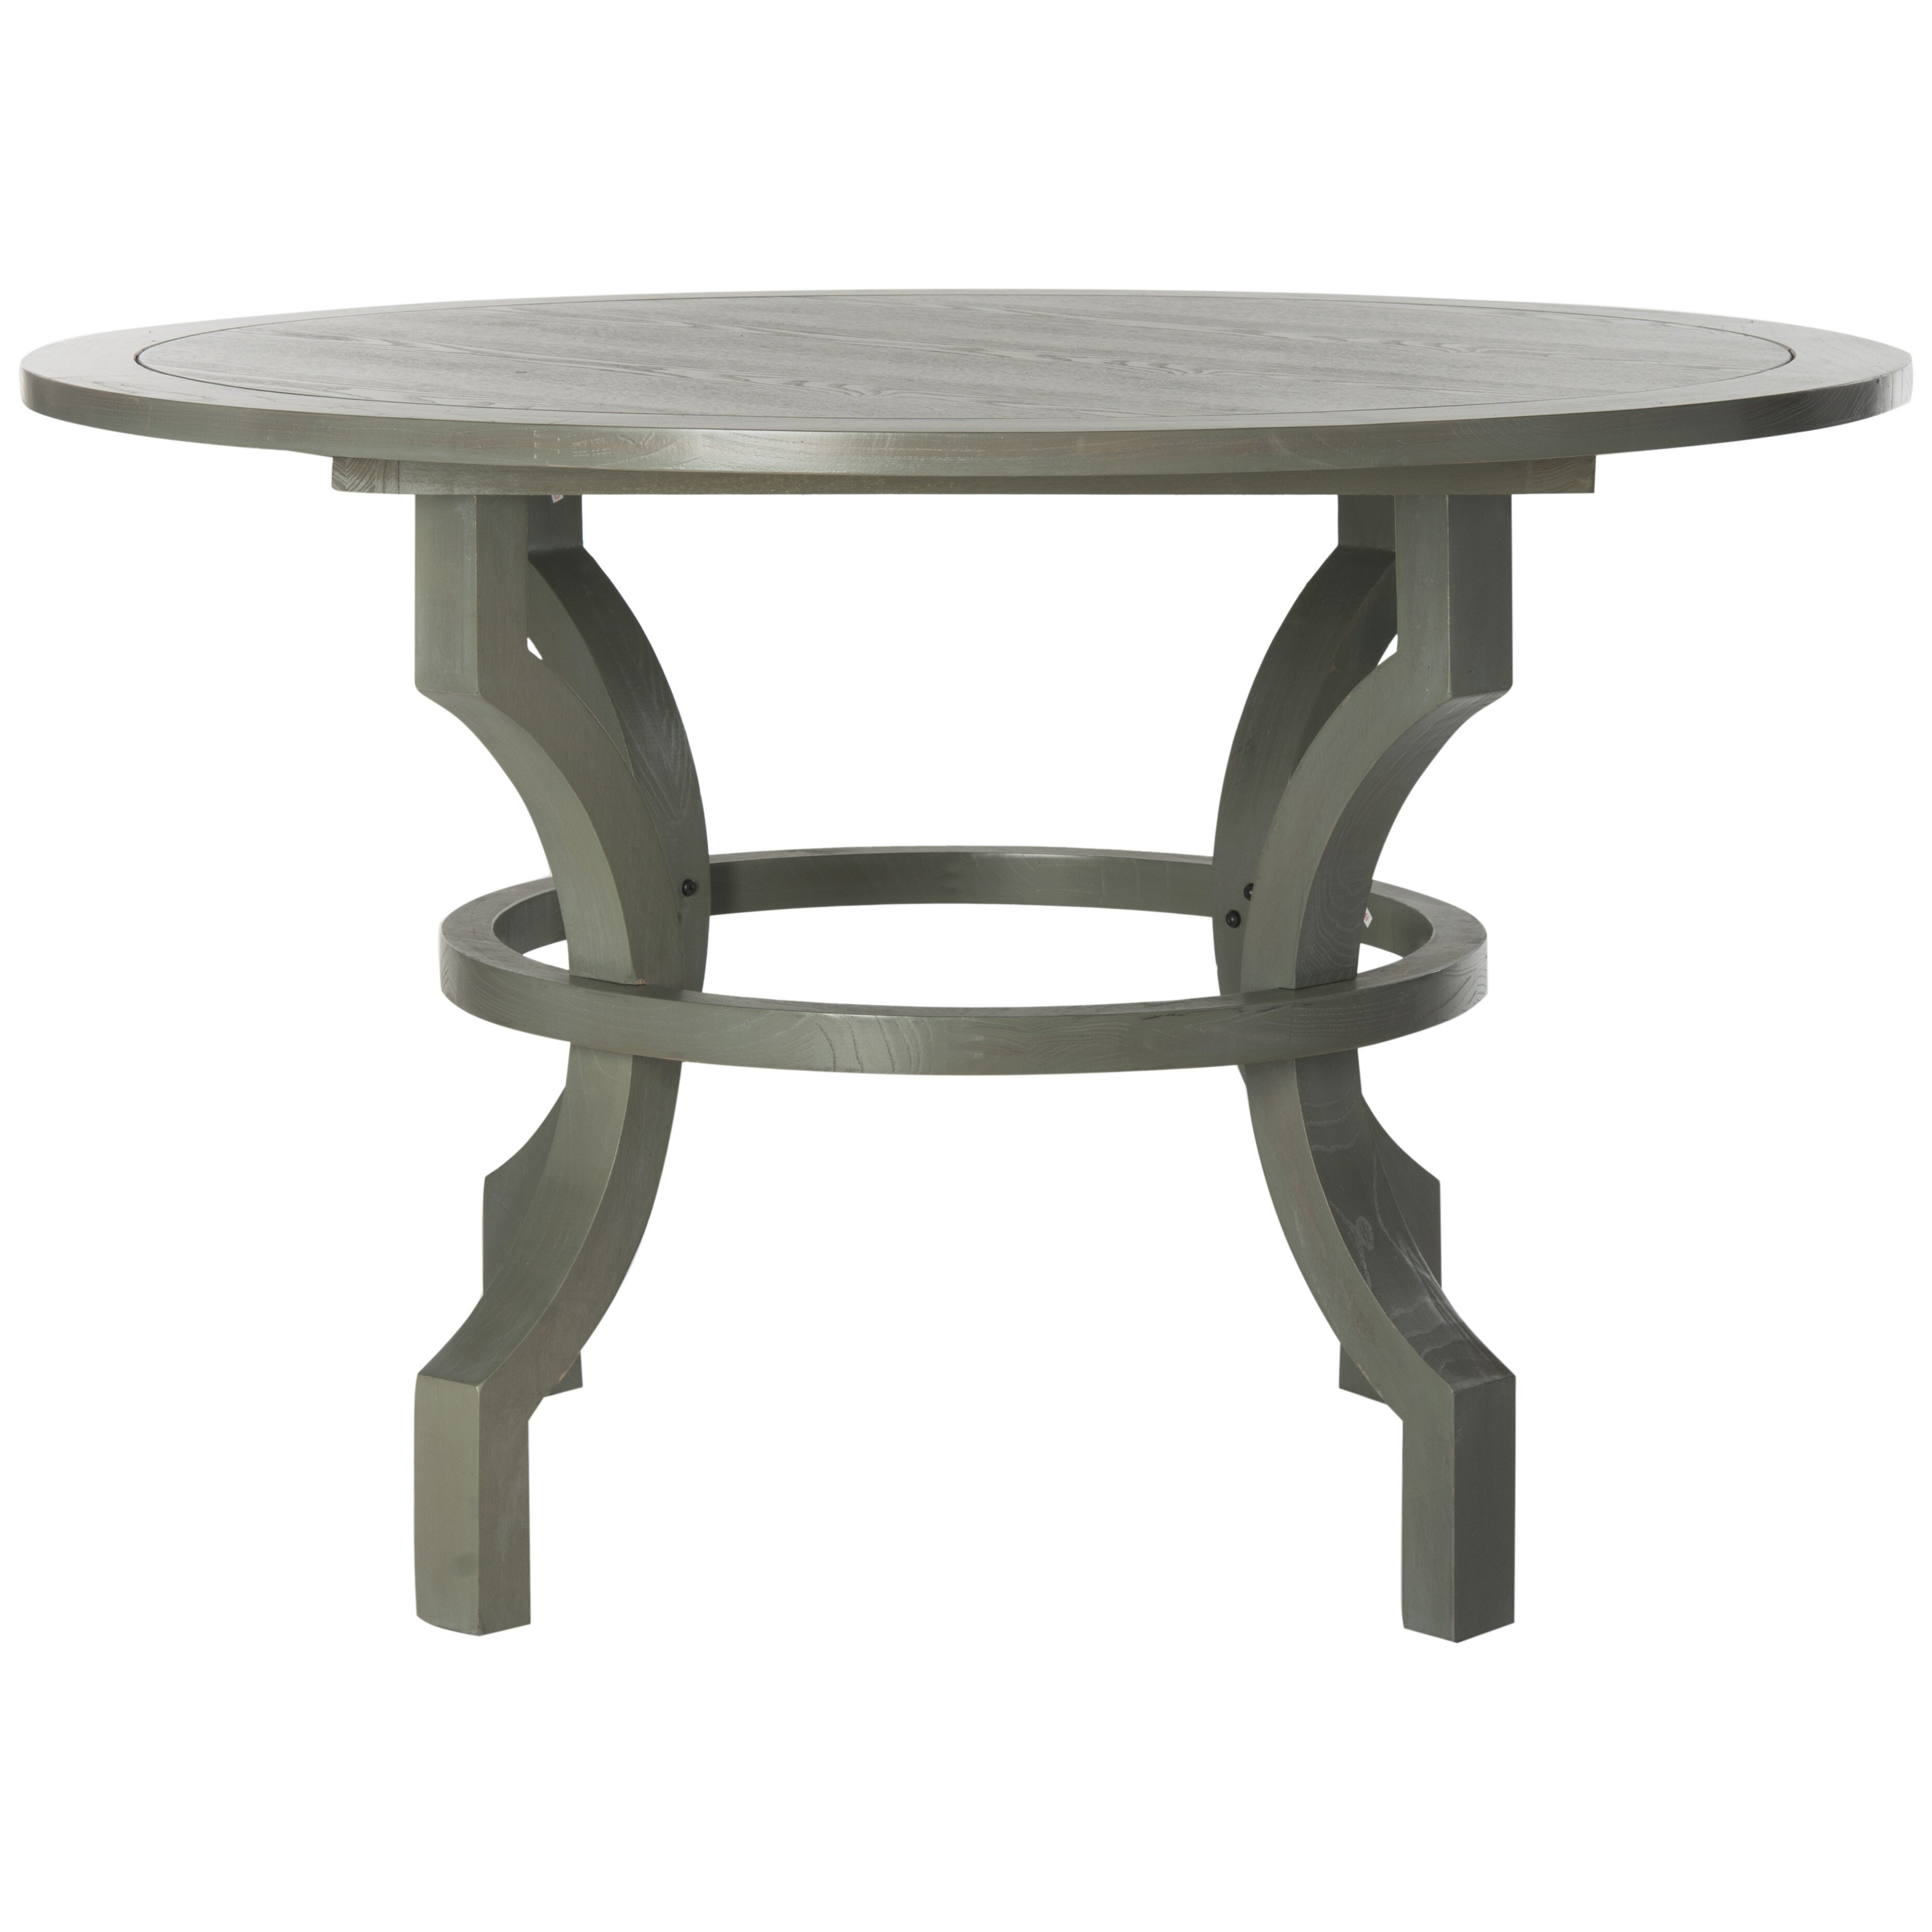 Beachcrest home deerfield dining table reviews wayfair for Wayfair dining table